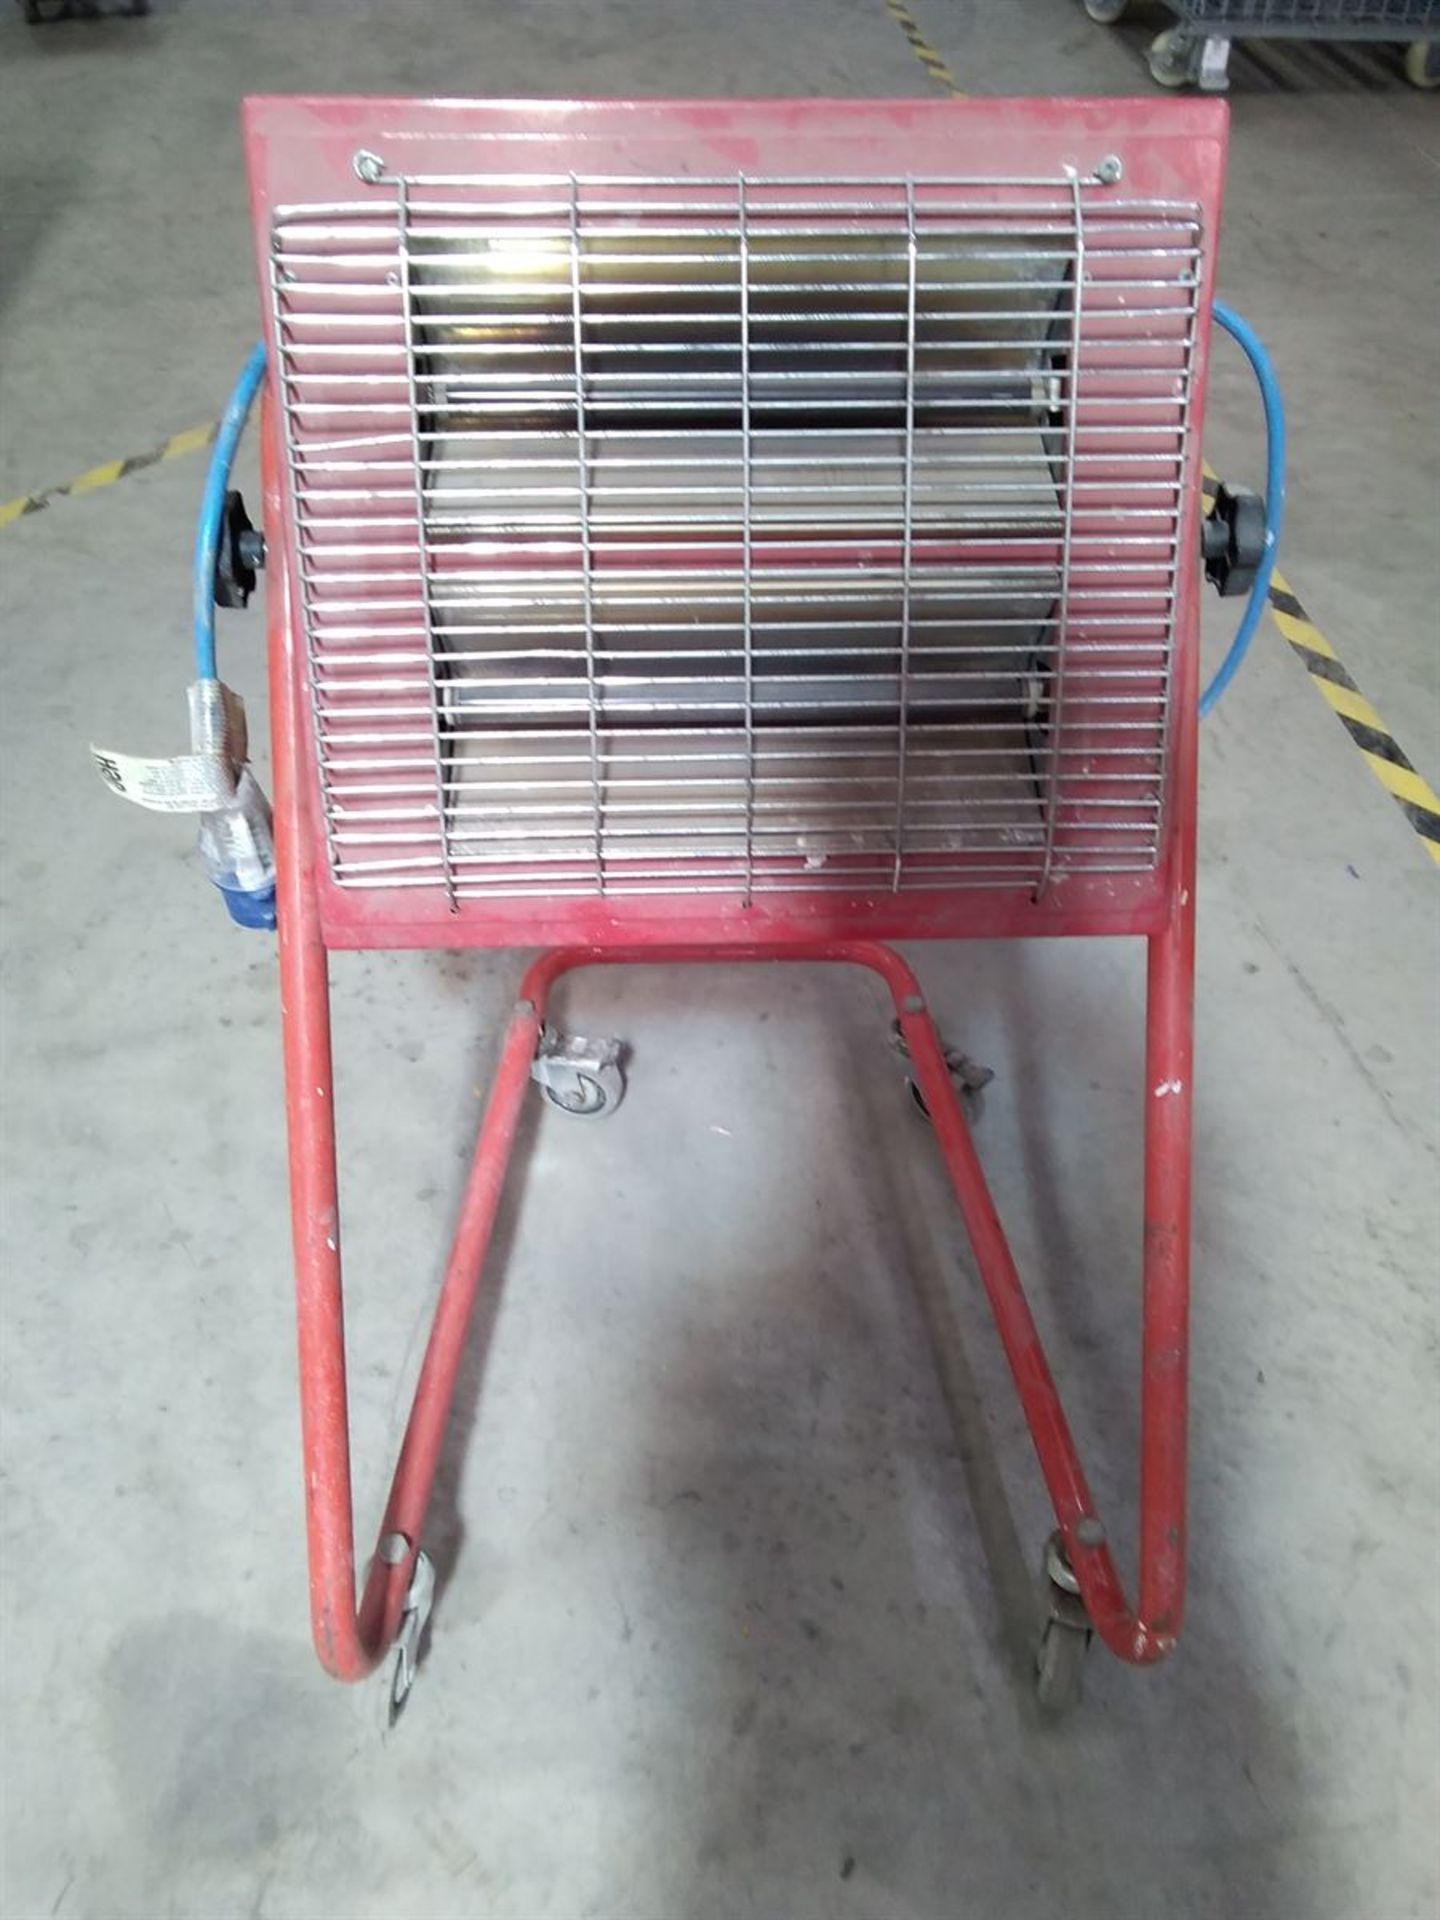 Lot 196 - Super Red Infra Red Radiant Heater 240V